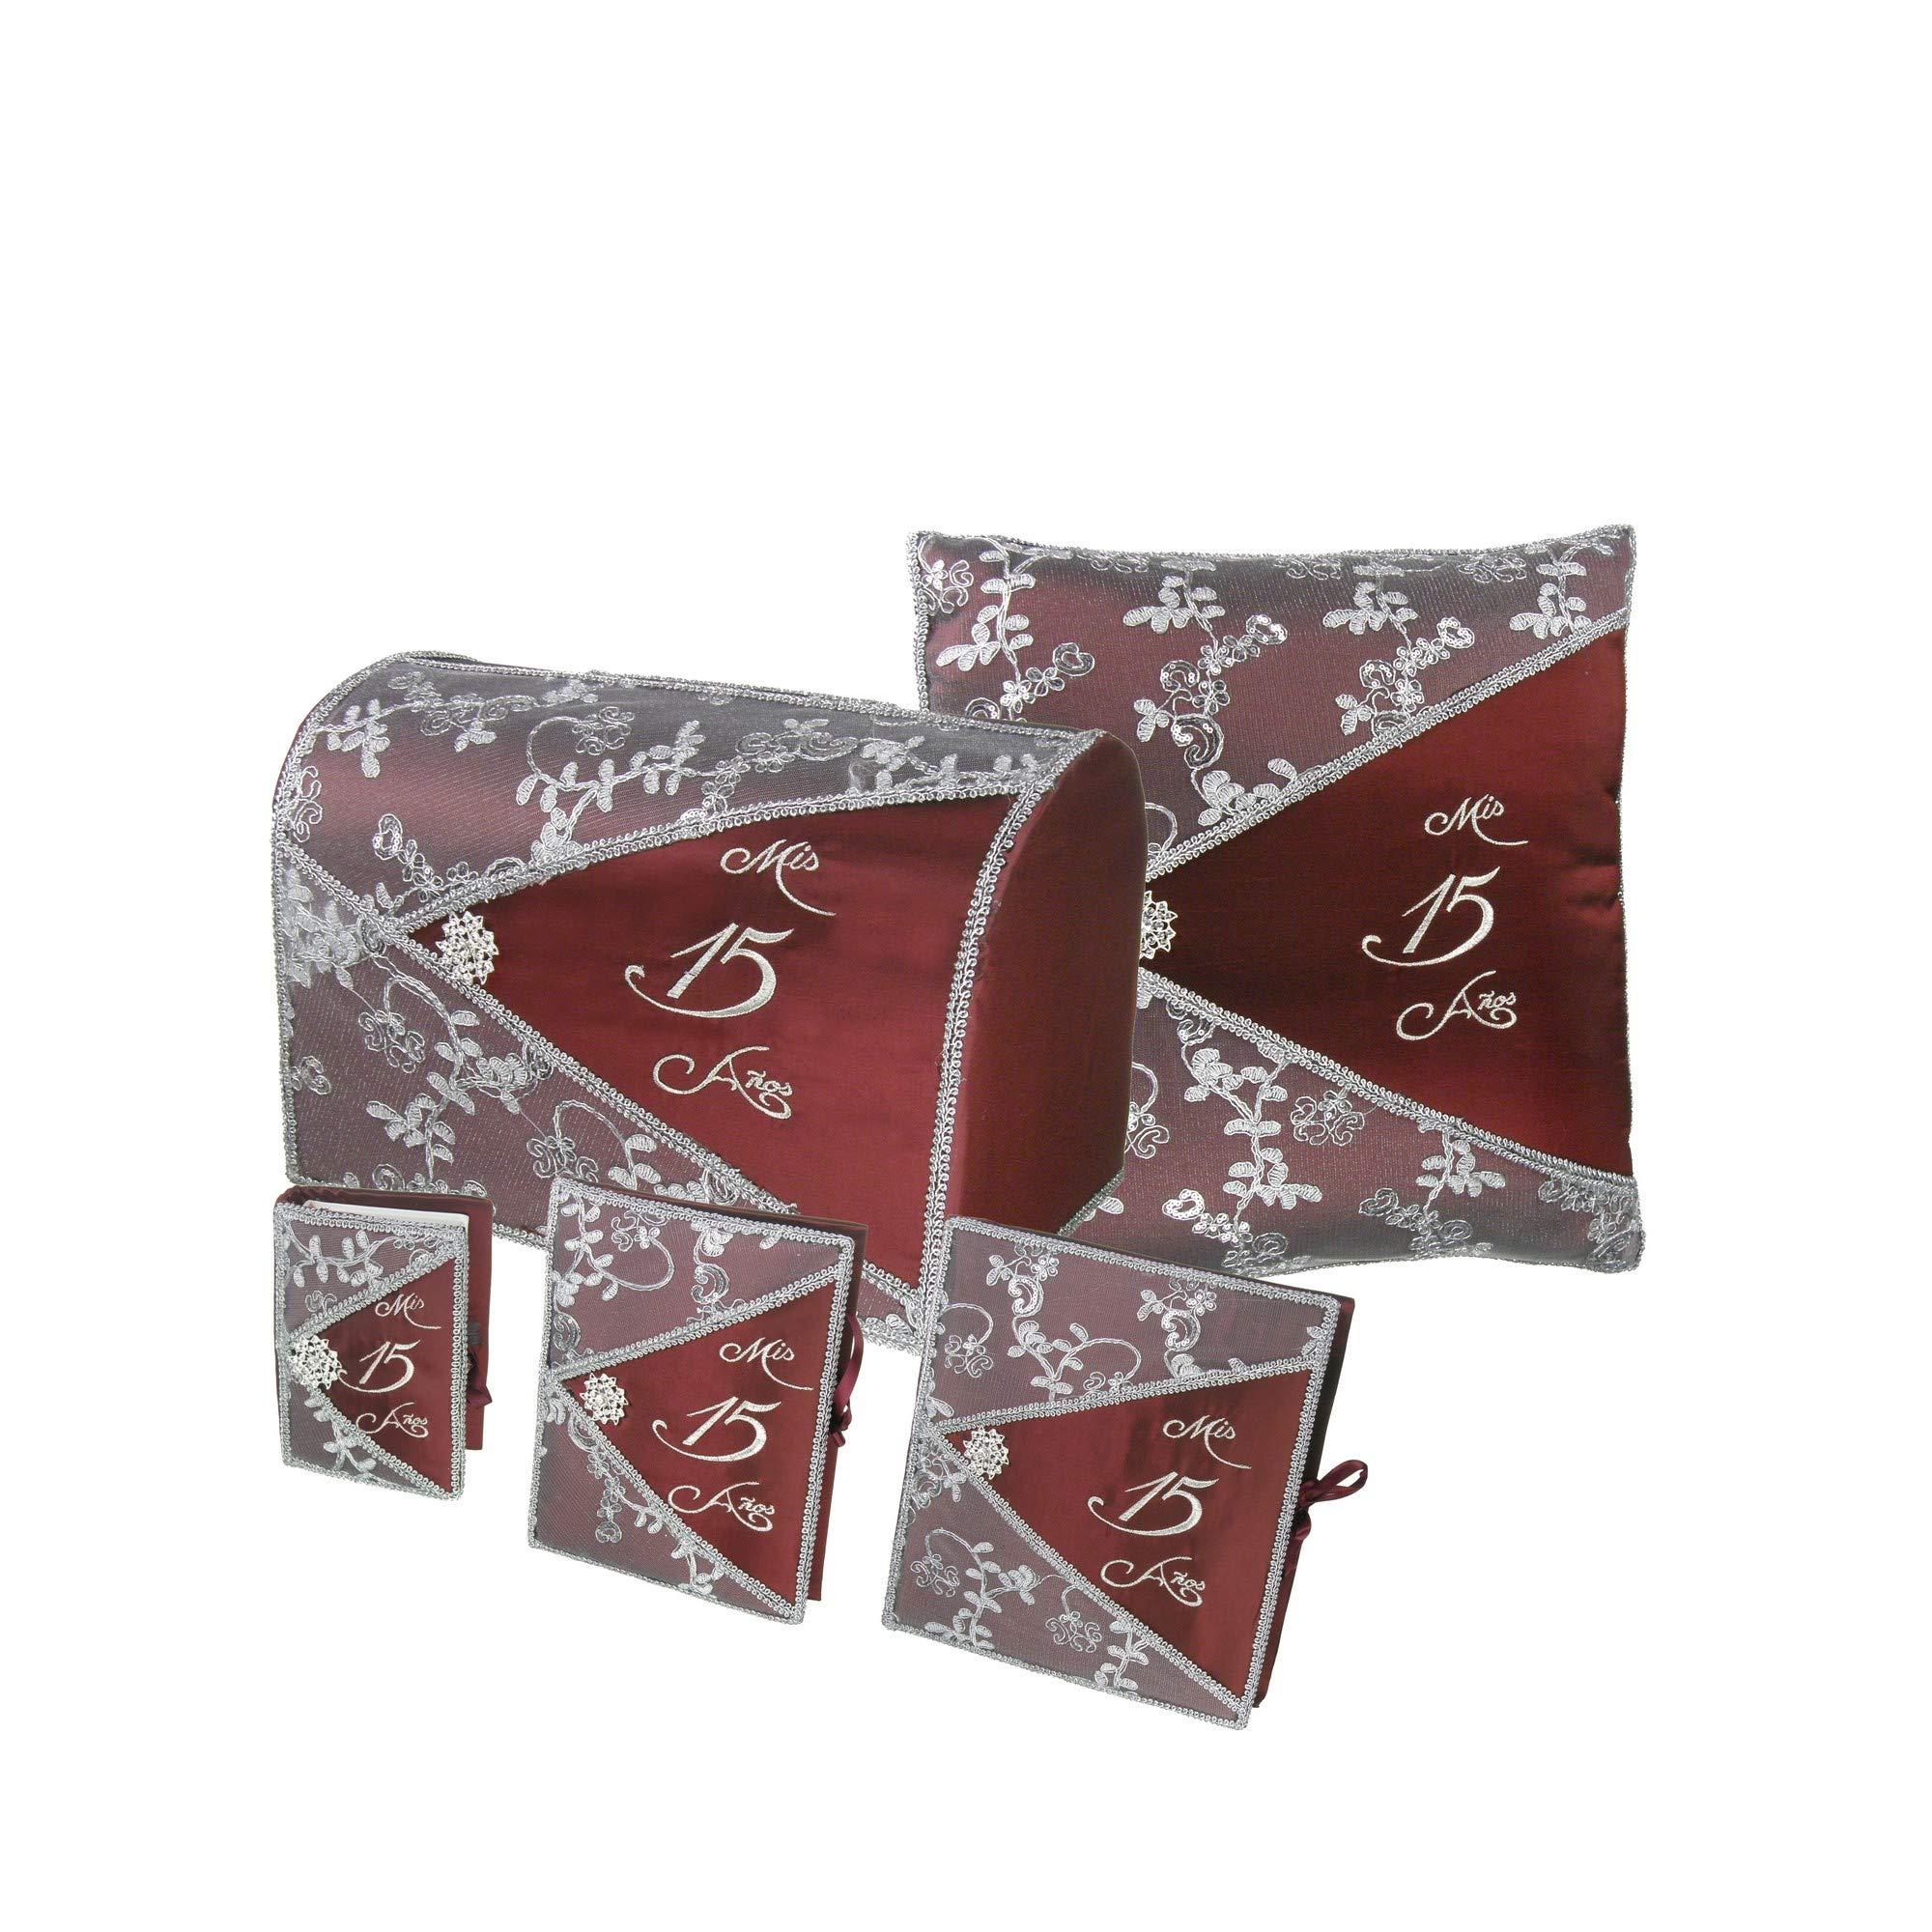 DivaDesigns Quinceañera Accessory Set Bible Guest Book Photo Album Gift Box Kneeling Pillow - Burgundy/Silver 200